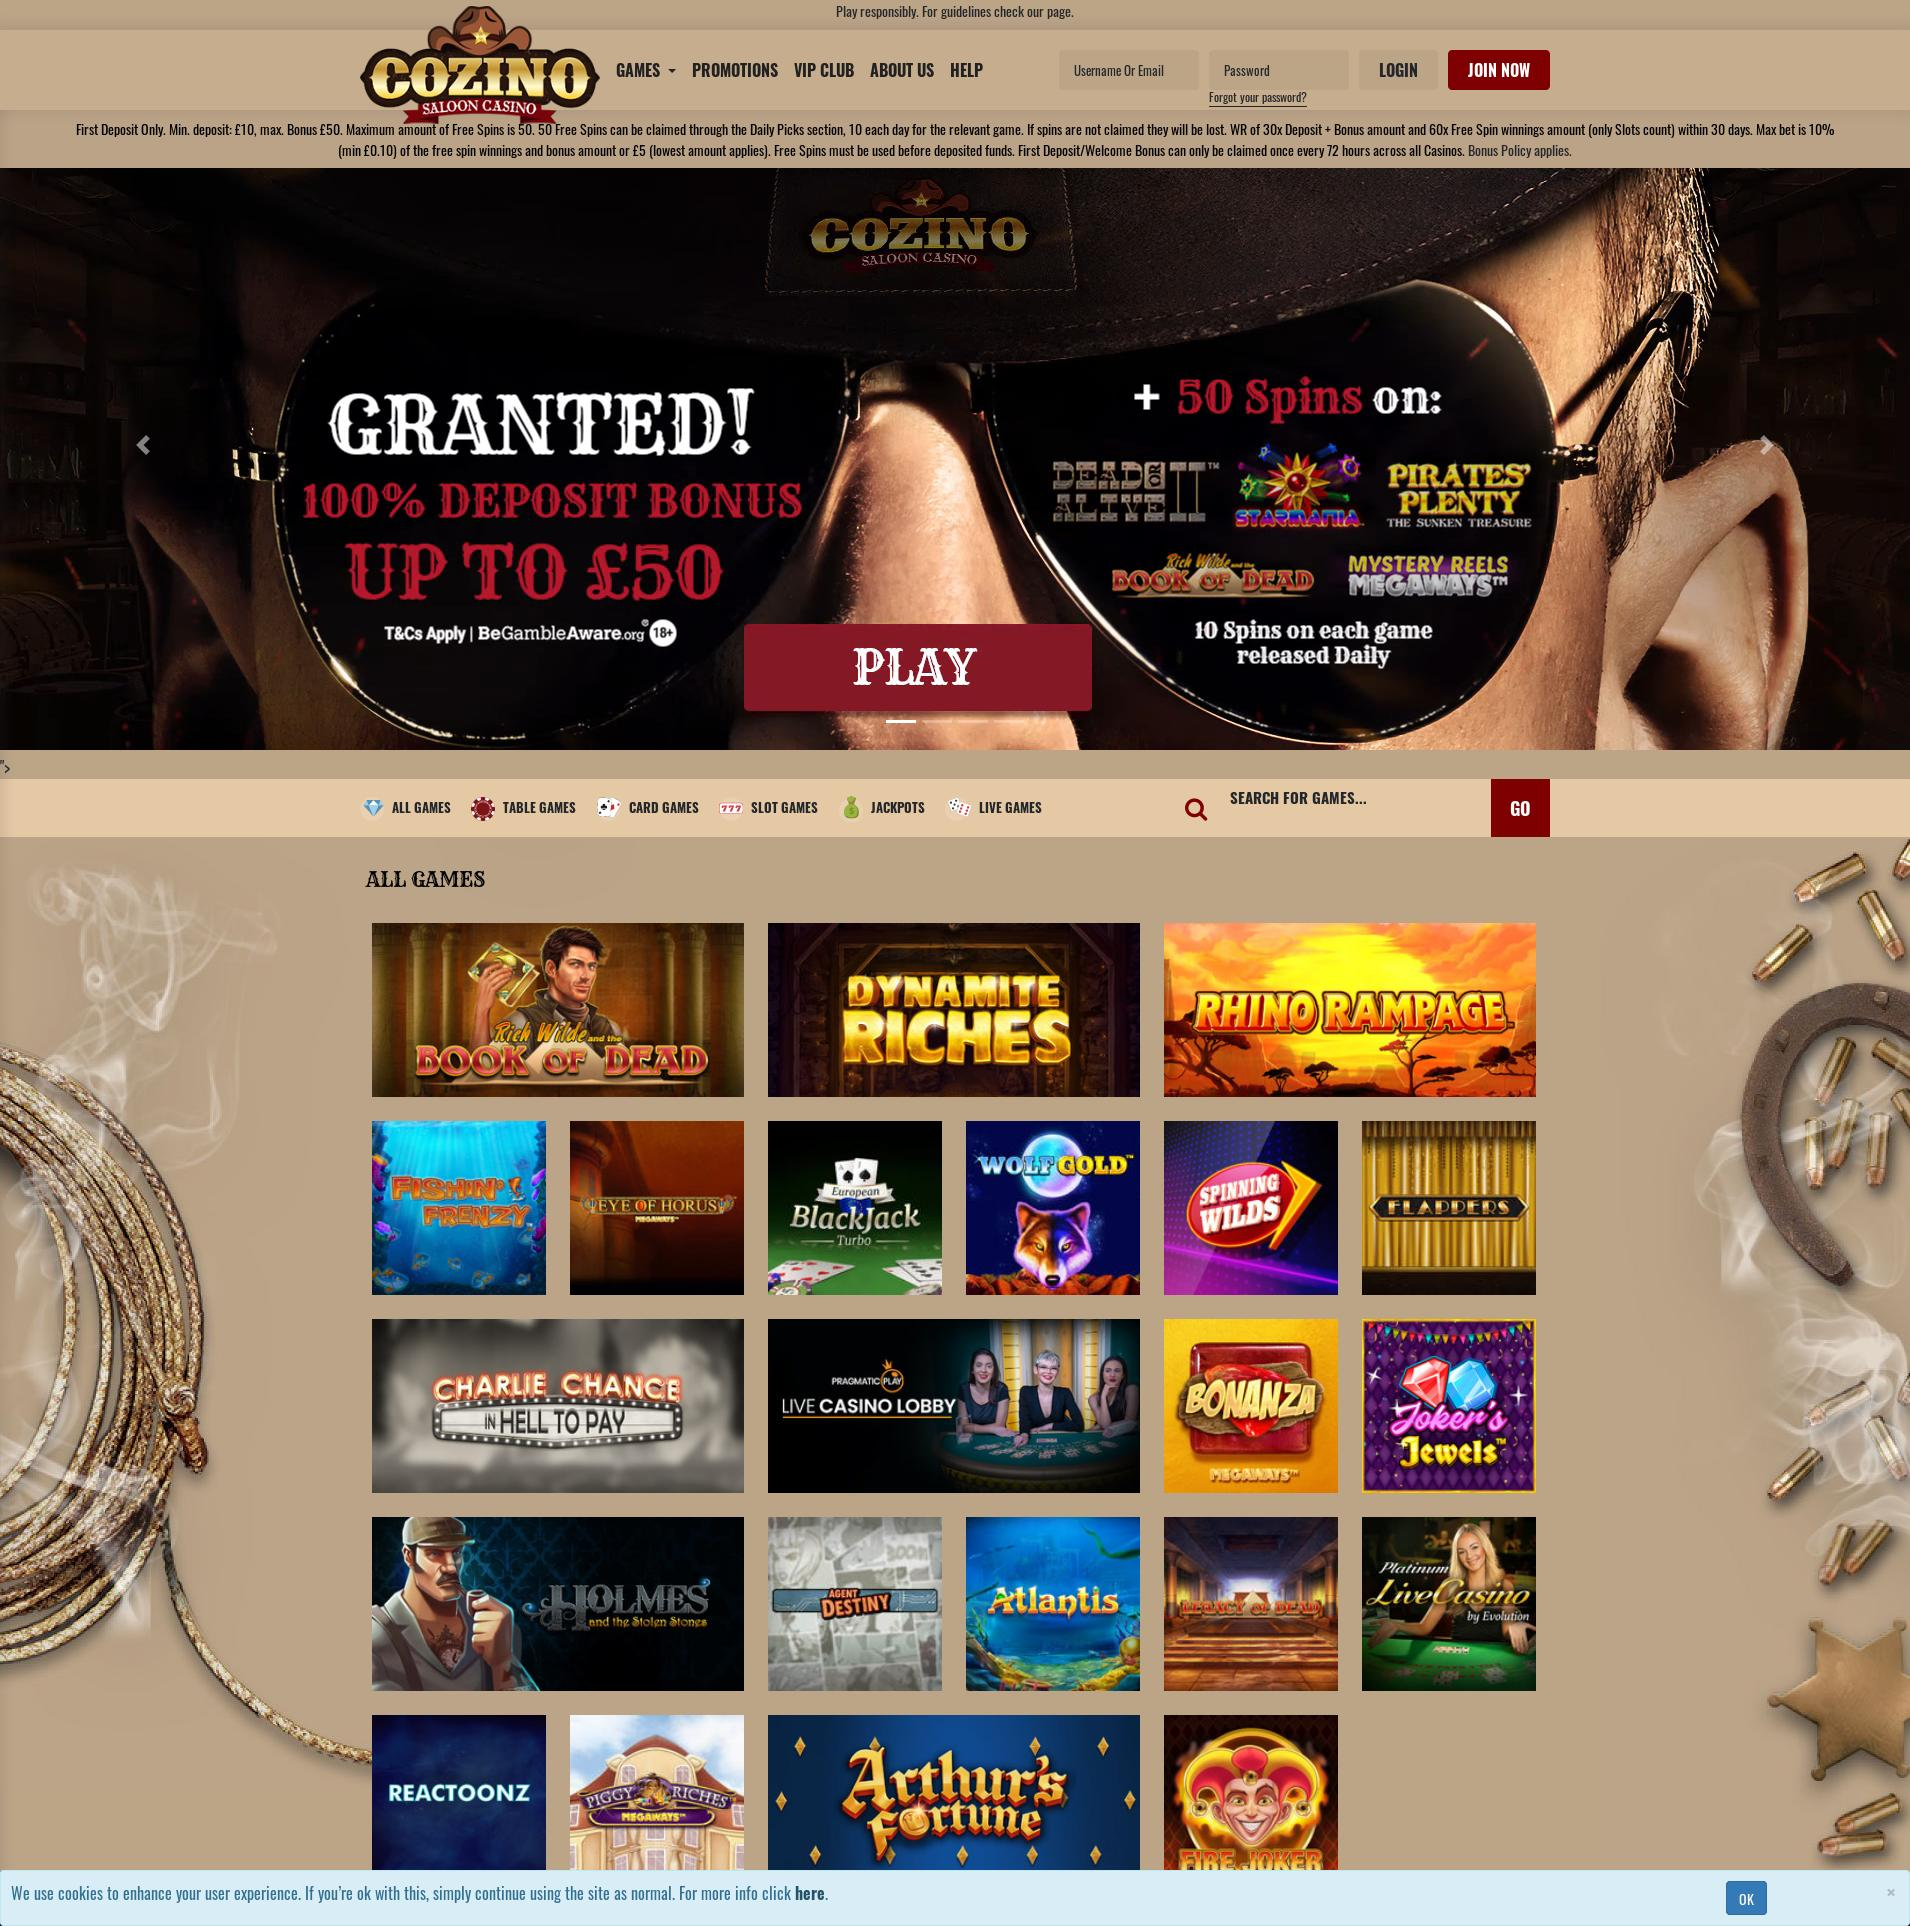 Casino screen Lobby 2020-05-24 for United Kingdom